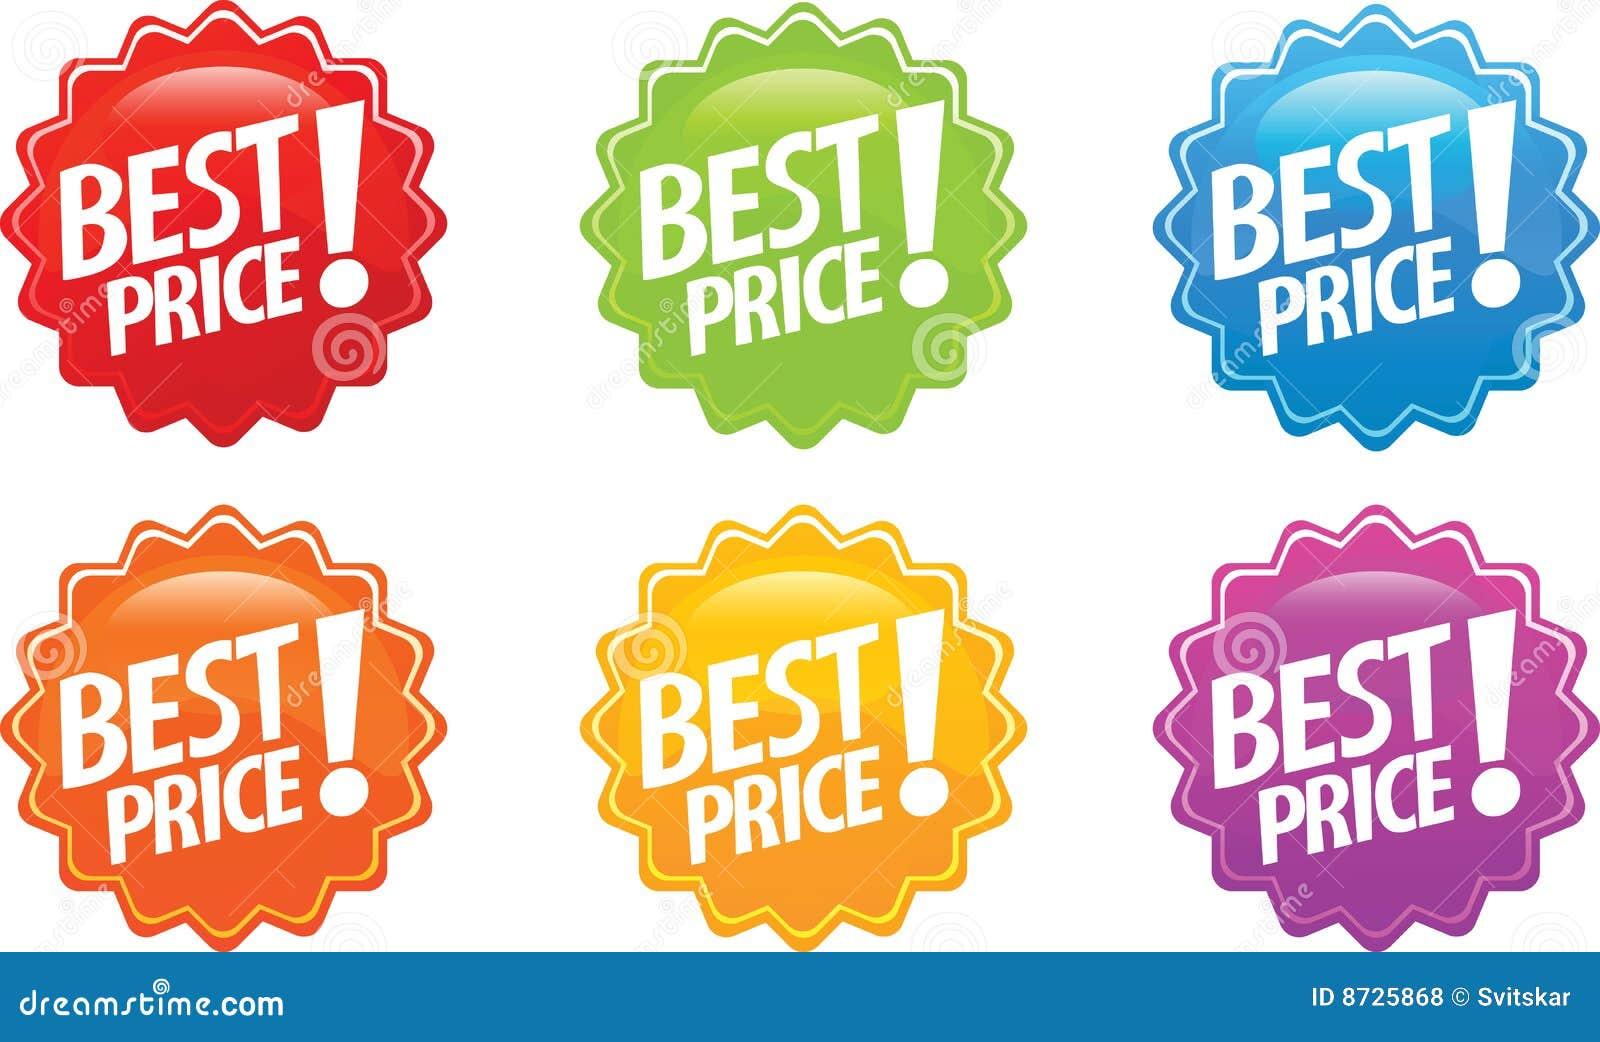 Best price glossy sticker